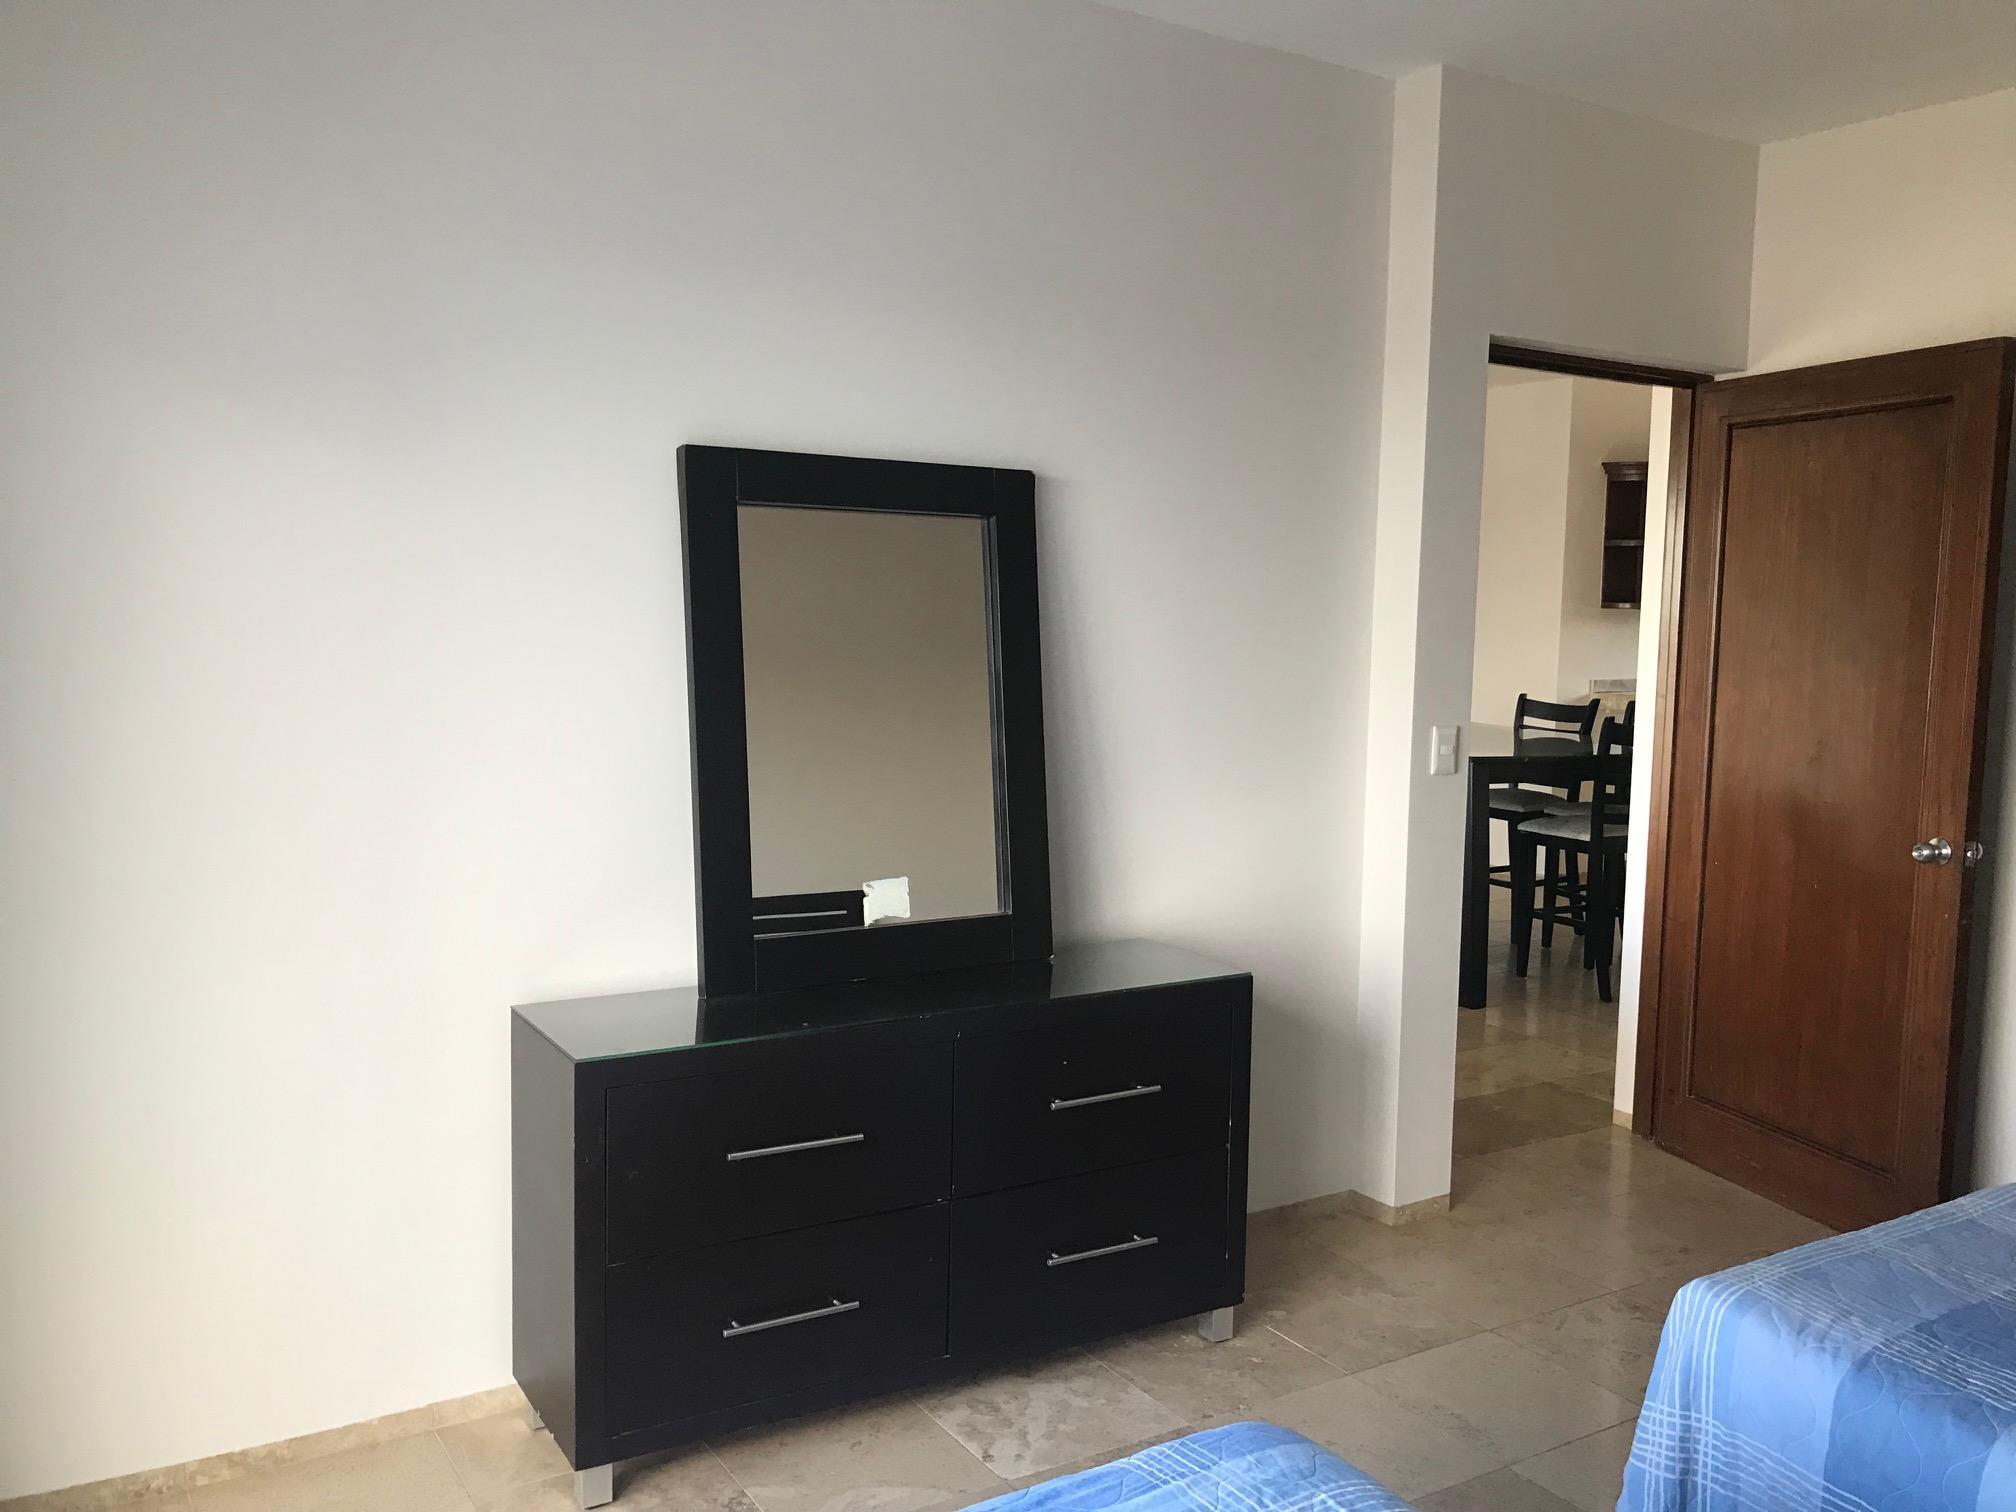 House – – 3 Bedrooms – 3 Bathrooms – Price $299,000 – 19-464 ...